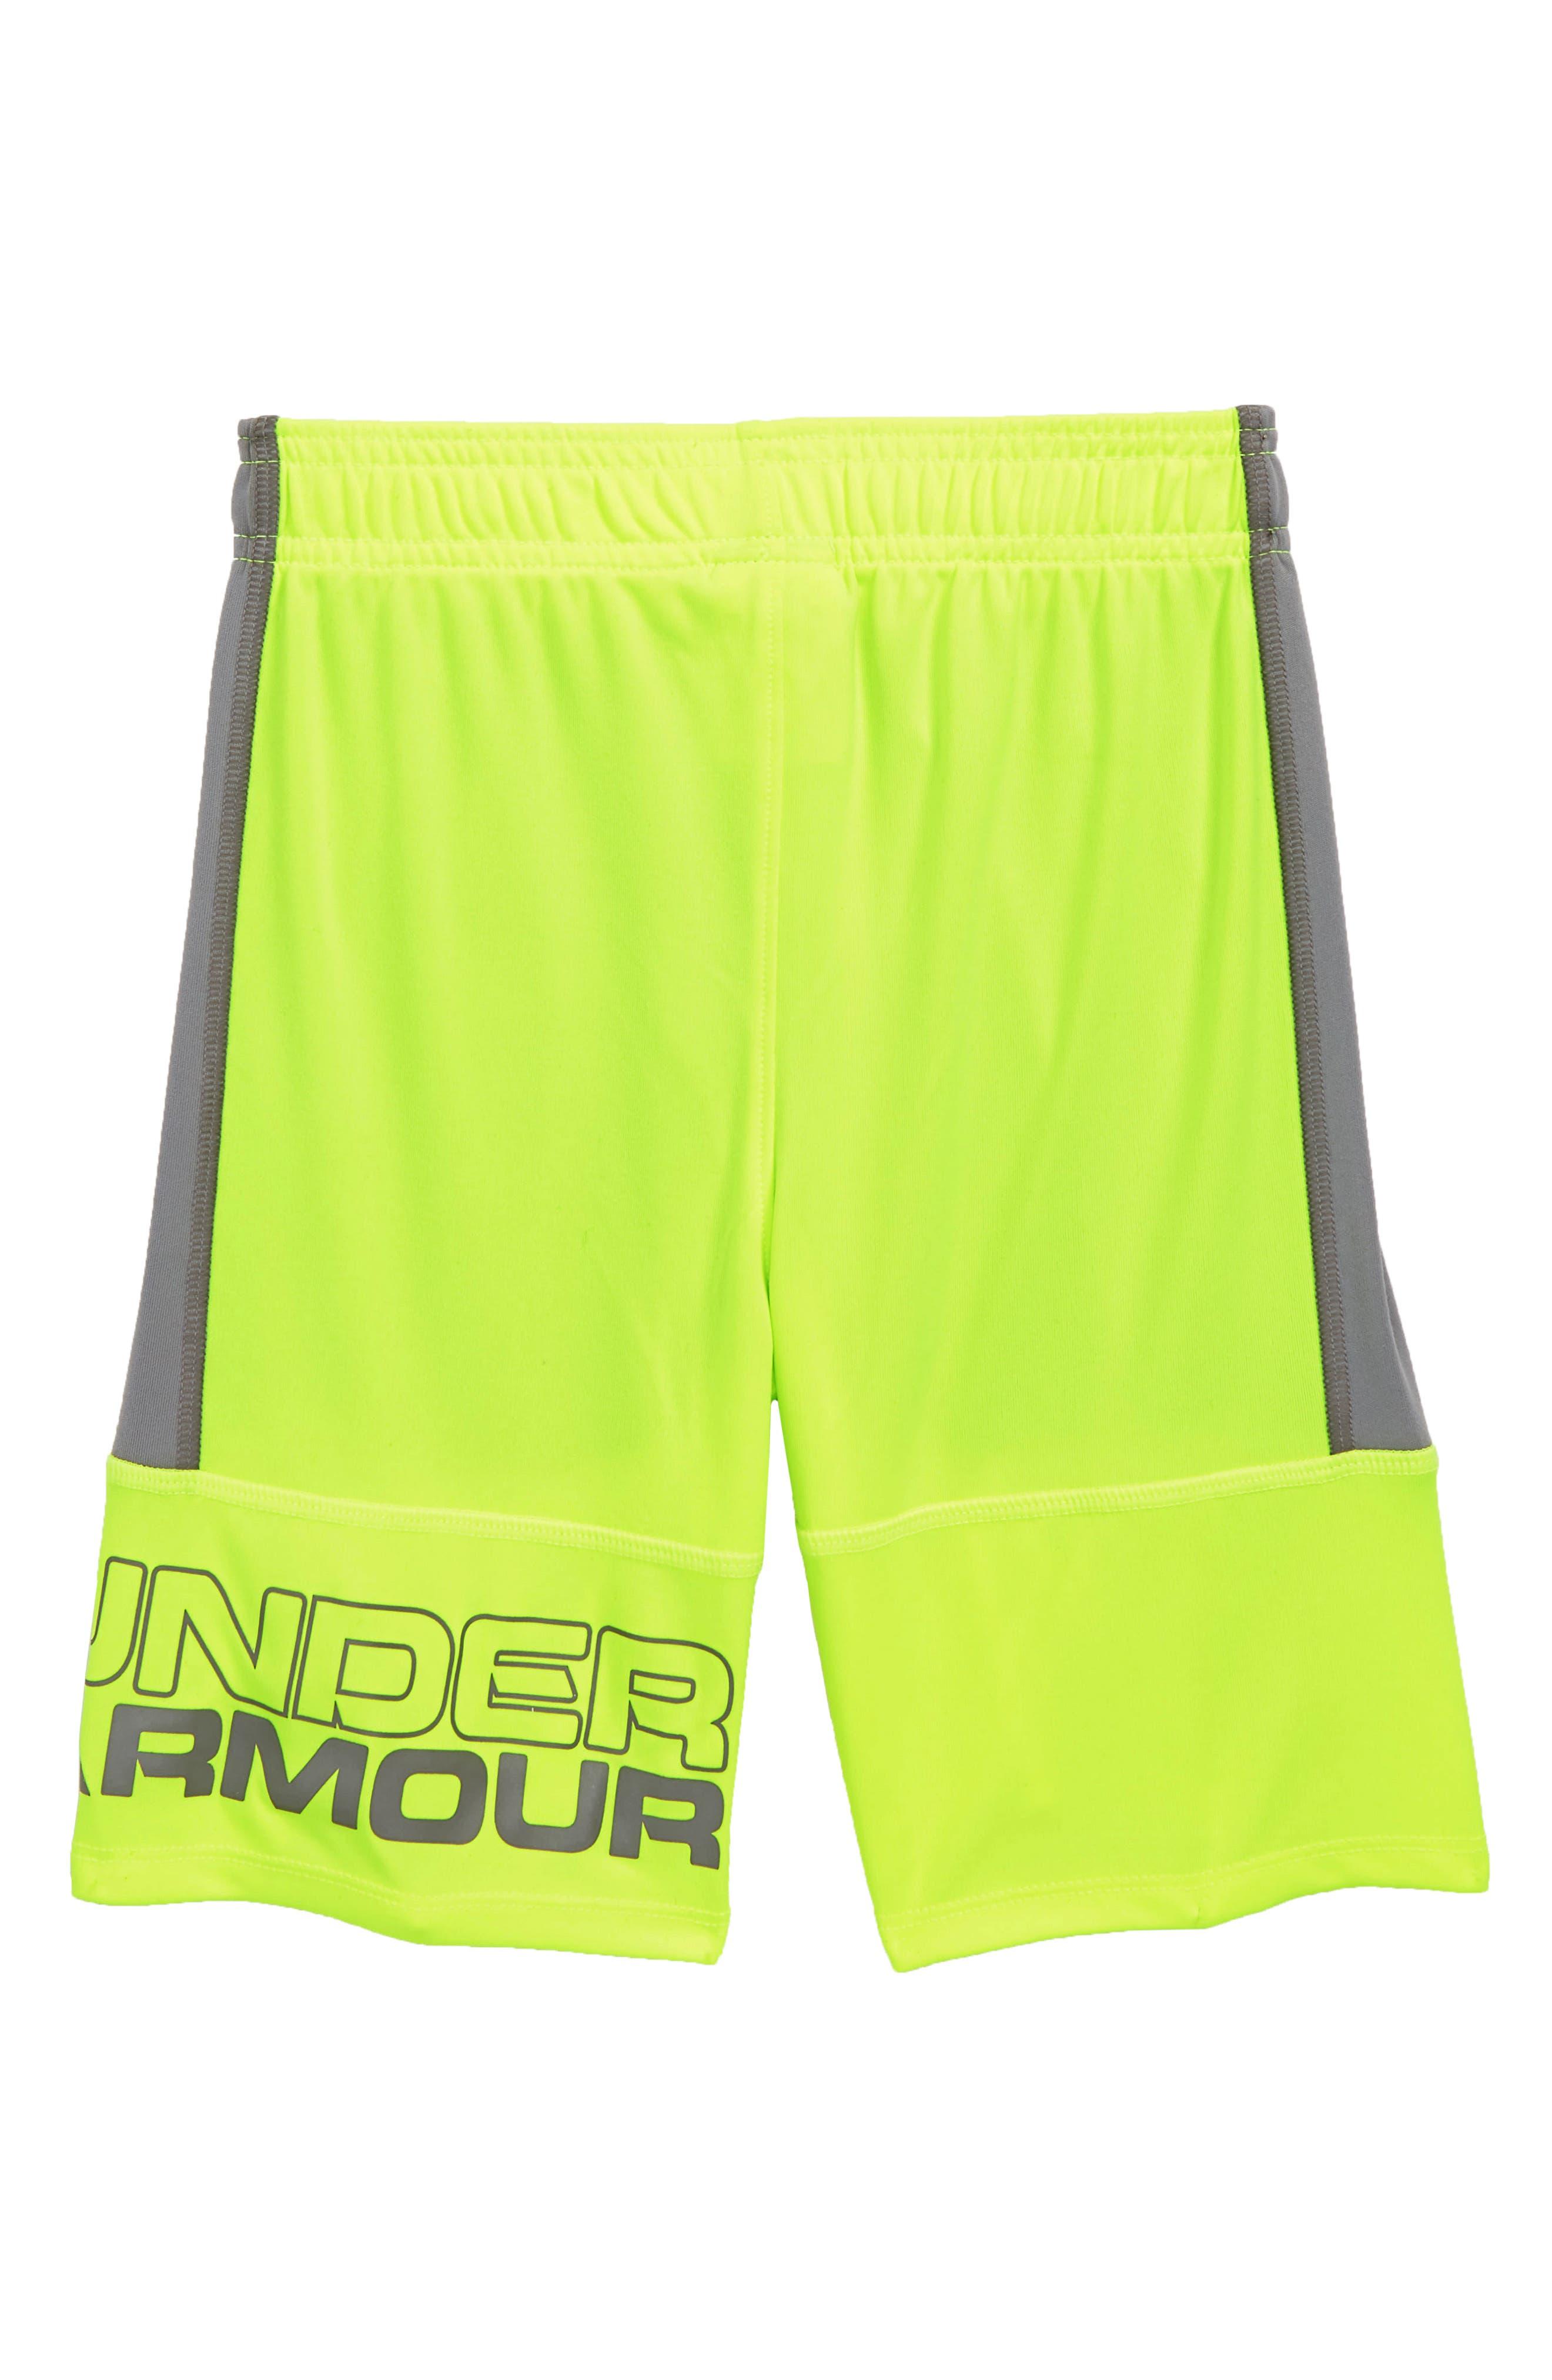 Stunt Shorts,                             Alternate thumbnail 2, color,                             Hi Vis Yellow Distinction